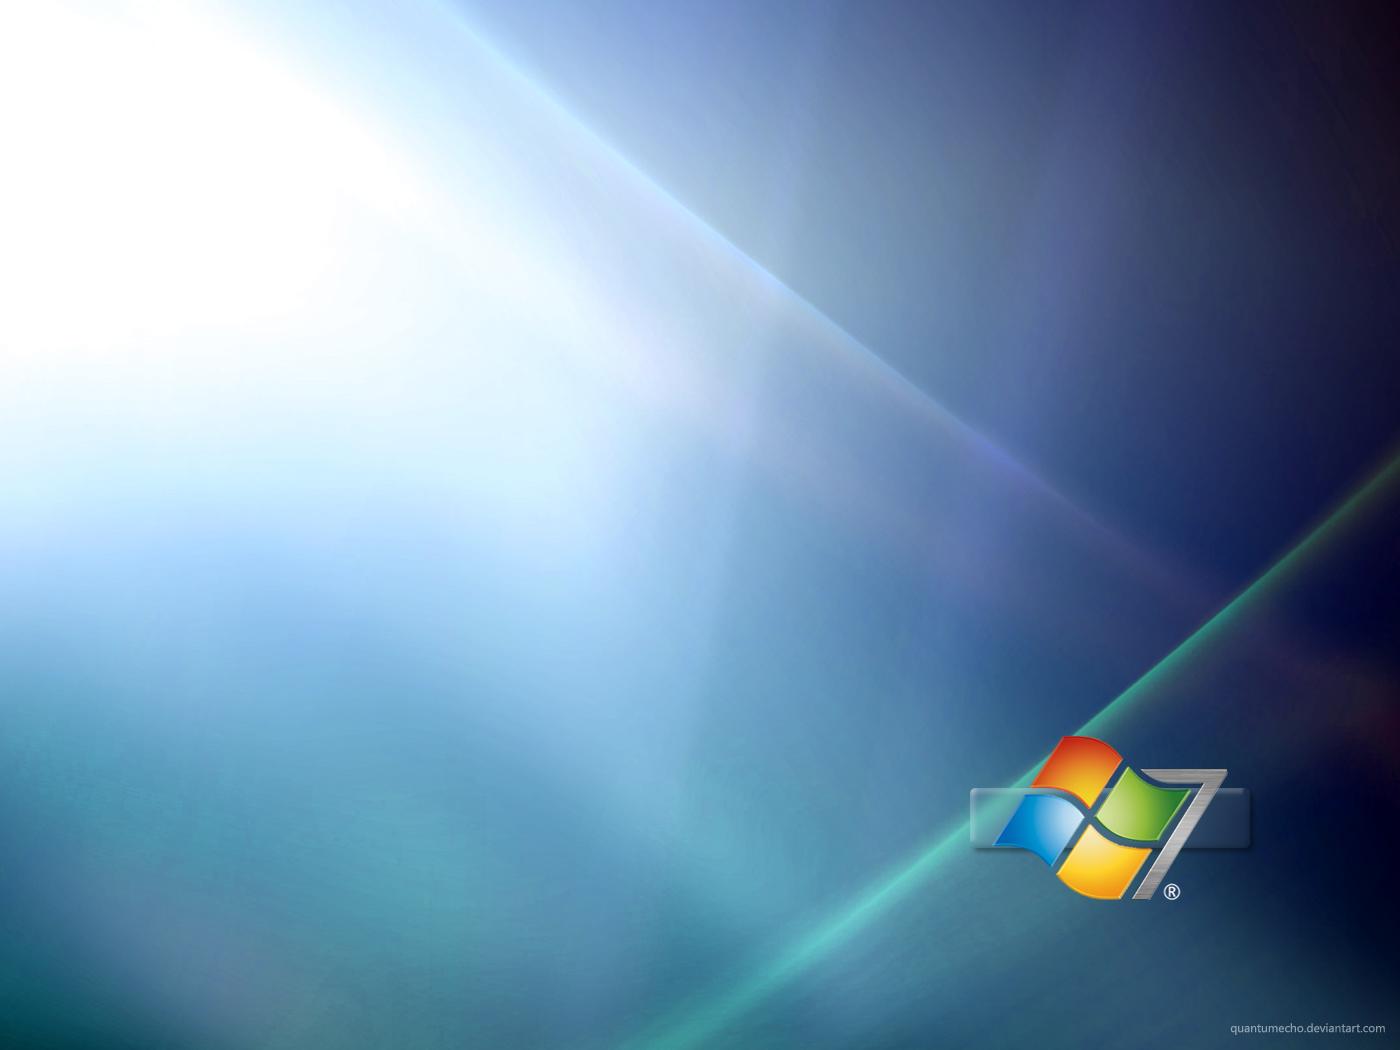 Windows 7 Wallpaper by QuantumEcho